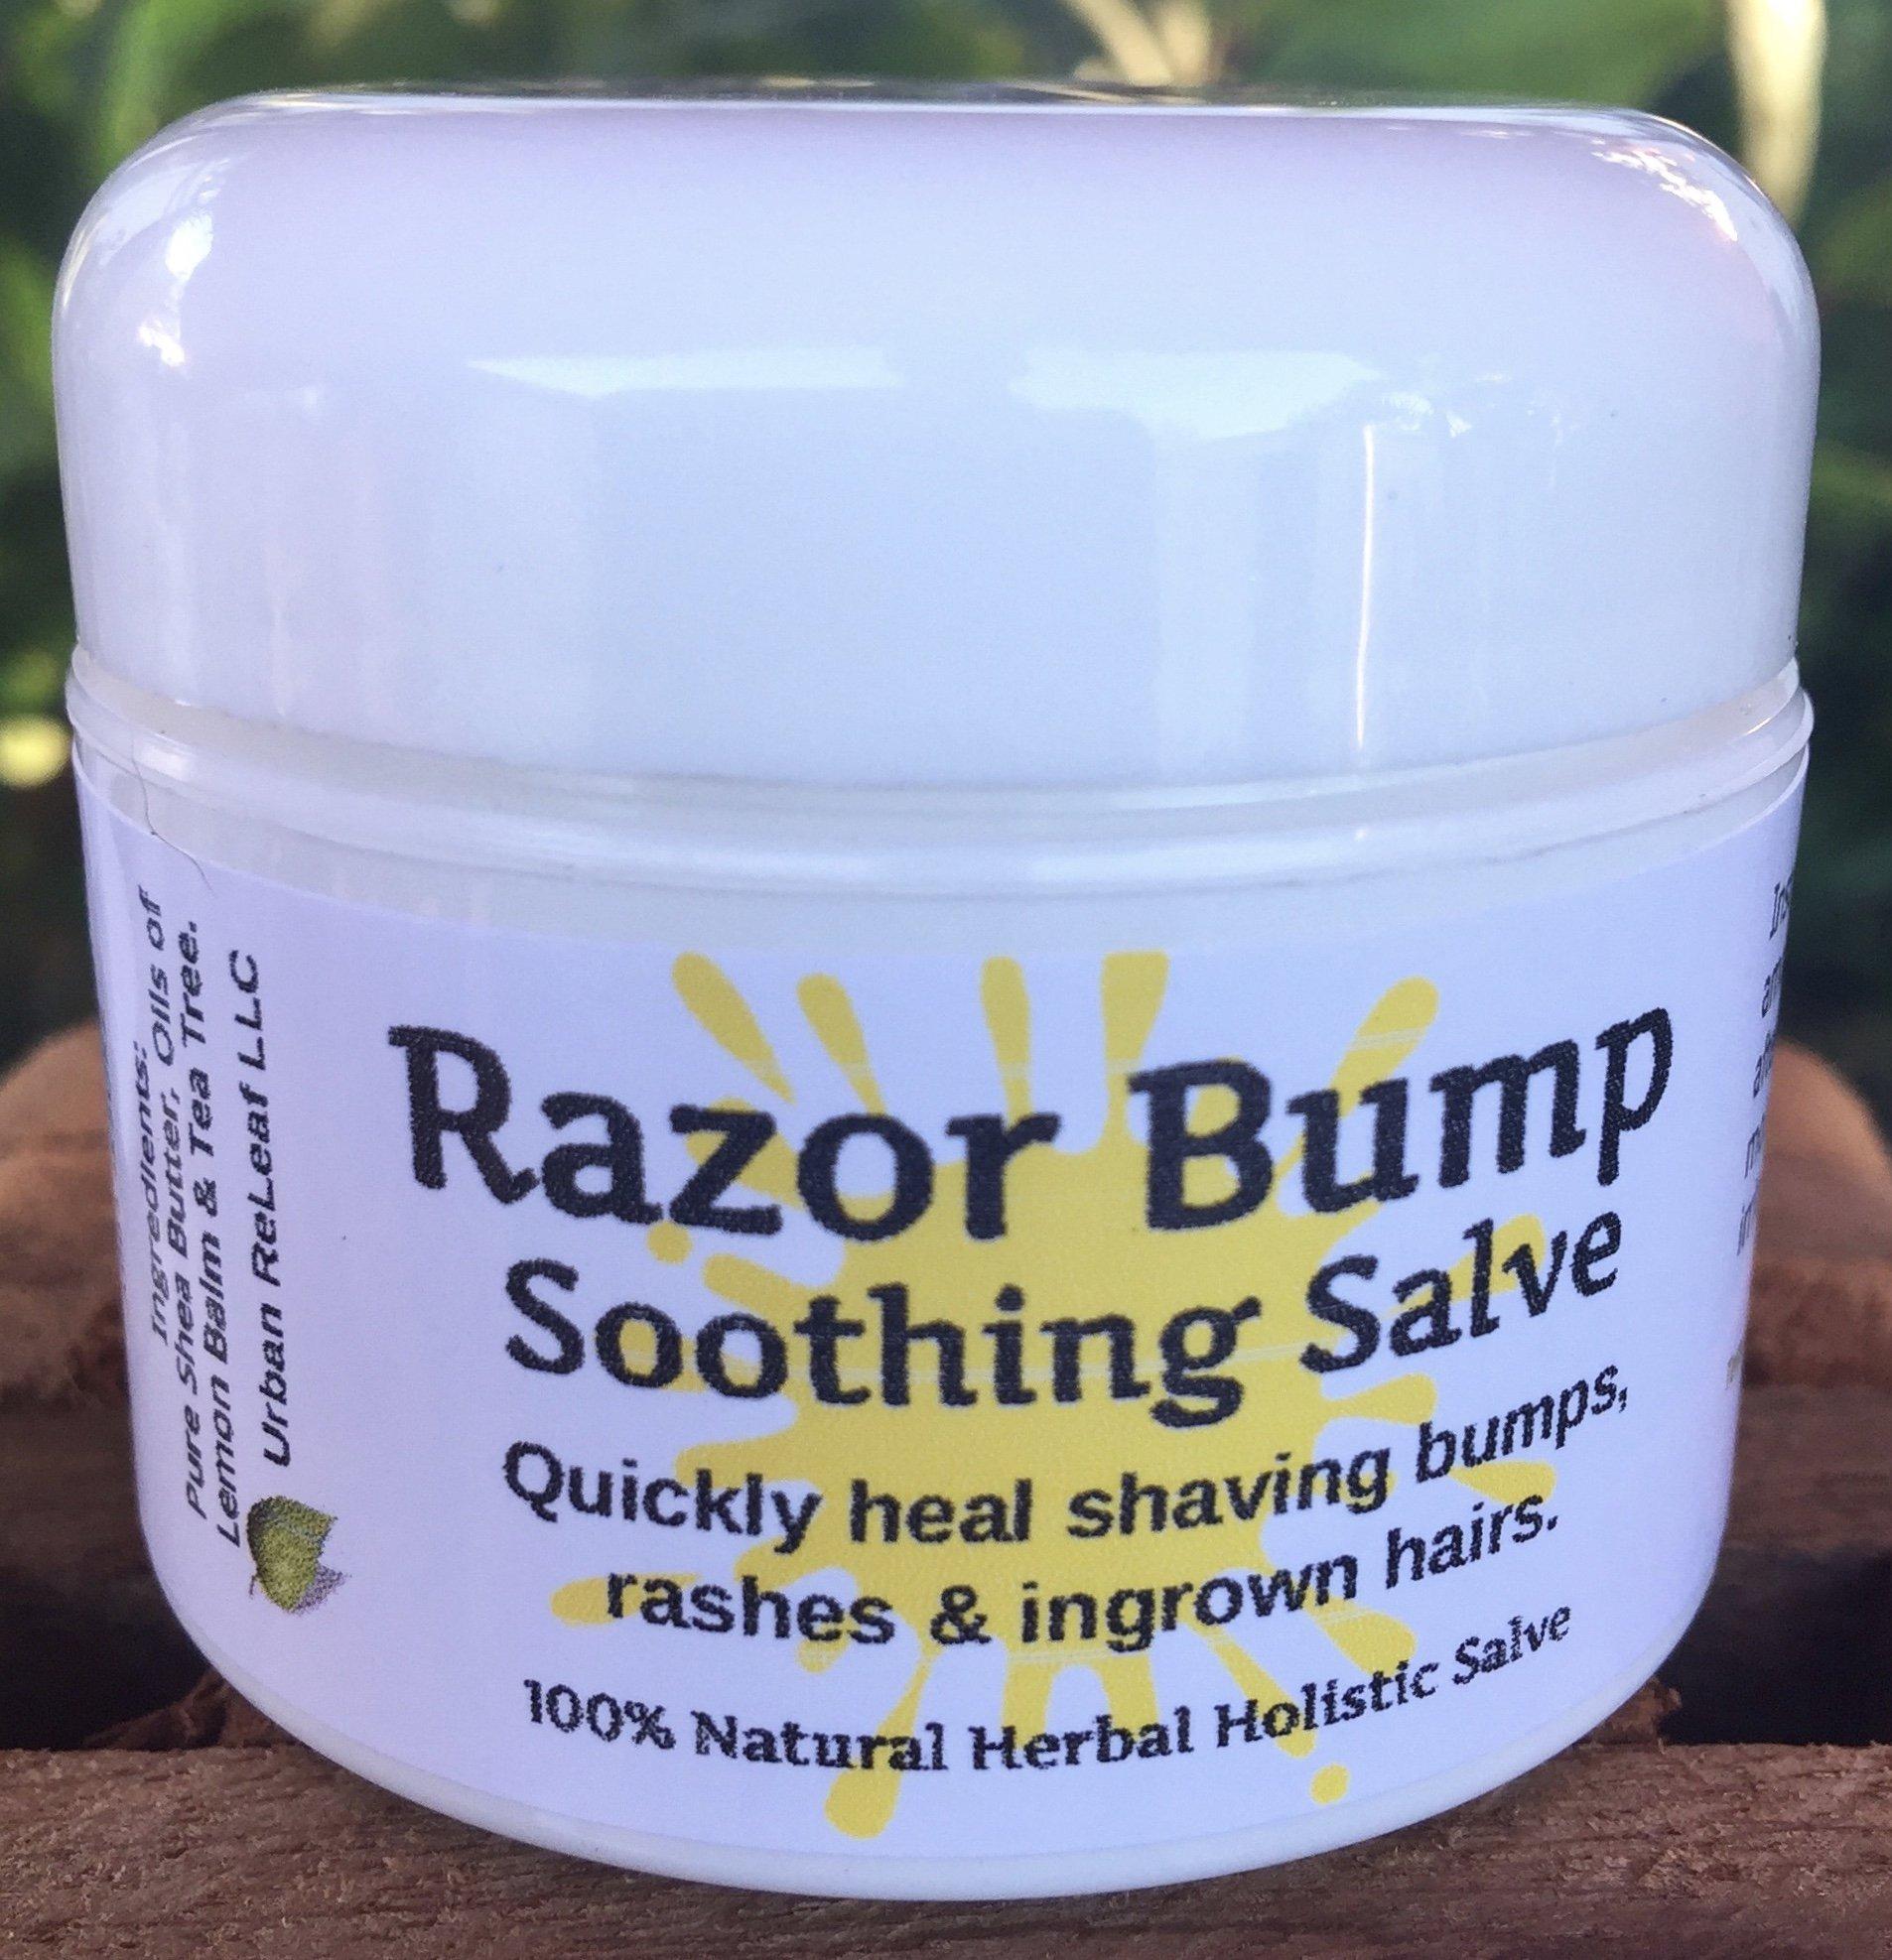 RAZOR BUMP Soothing Salve! 1 oz. Quickly soothe bumps, rashes, ingrown hairs & razor burn. 100% Natural, Vegan. Pure Shea, Tea Tree, Lemon Balm. For face, neck, bikini, body!